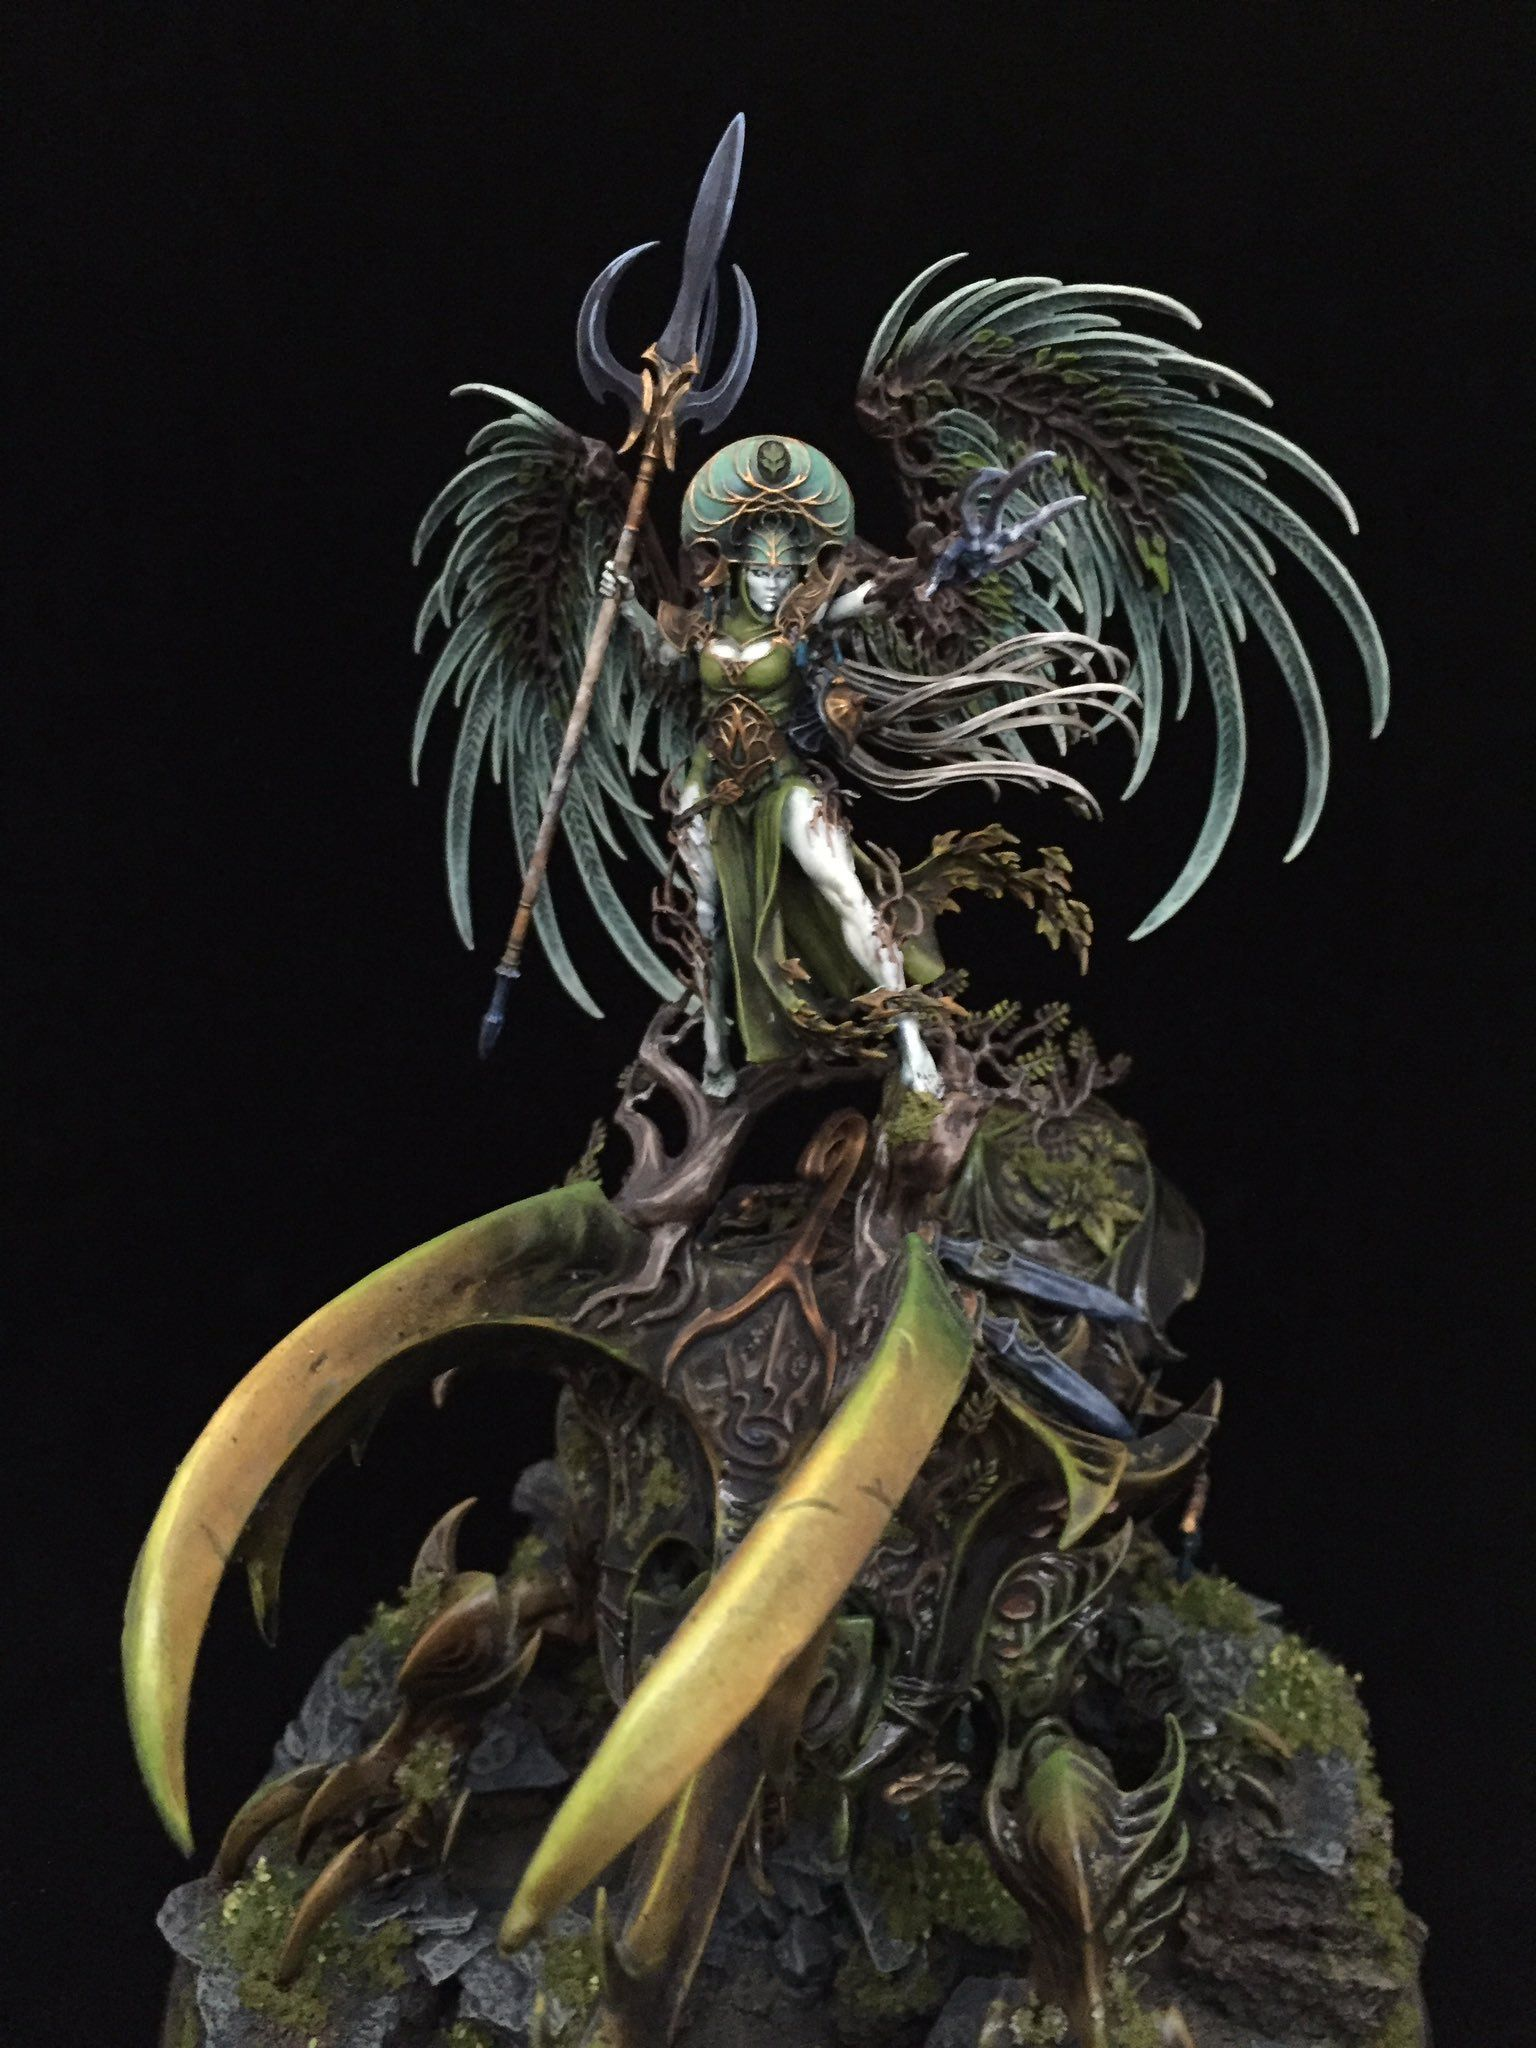 Warhammer wood elves, Warhammer fantasy, Miniature wargaming